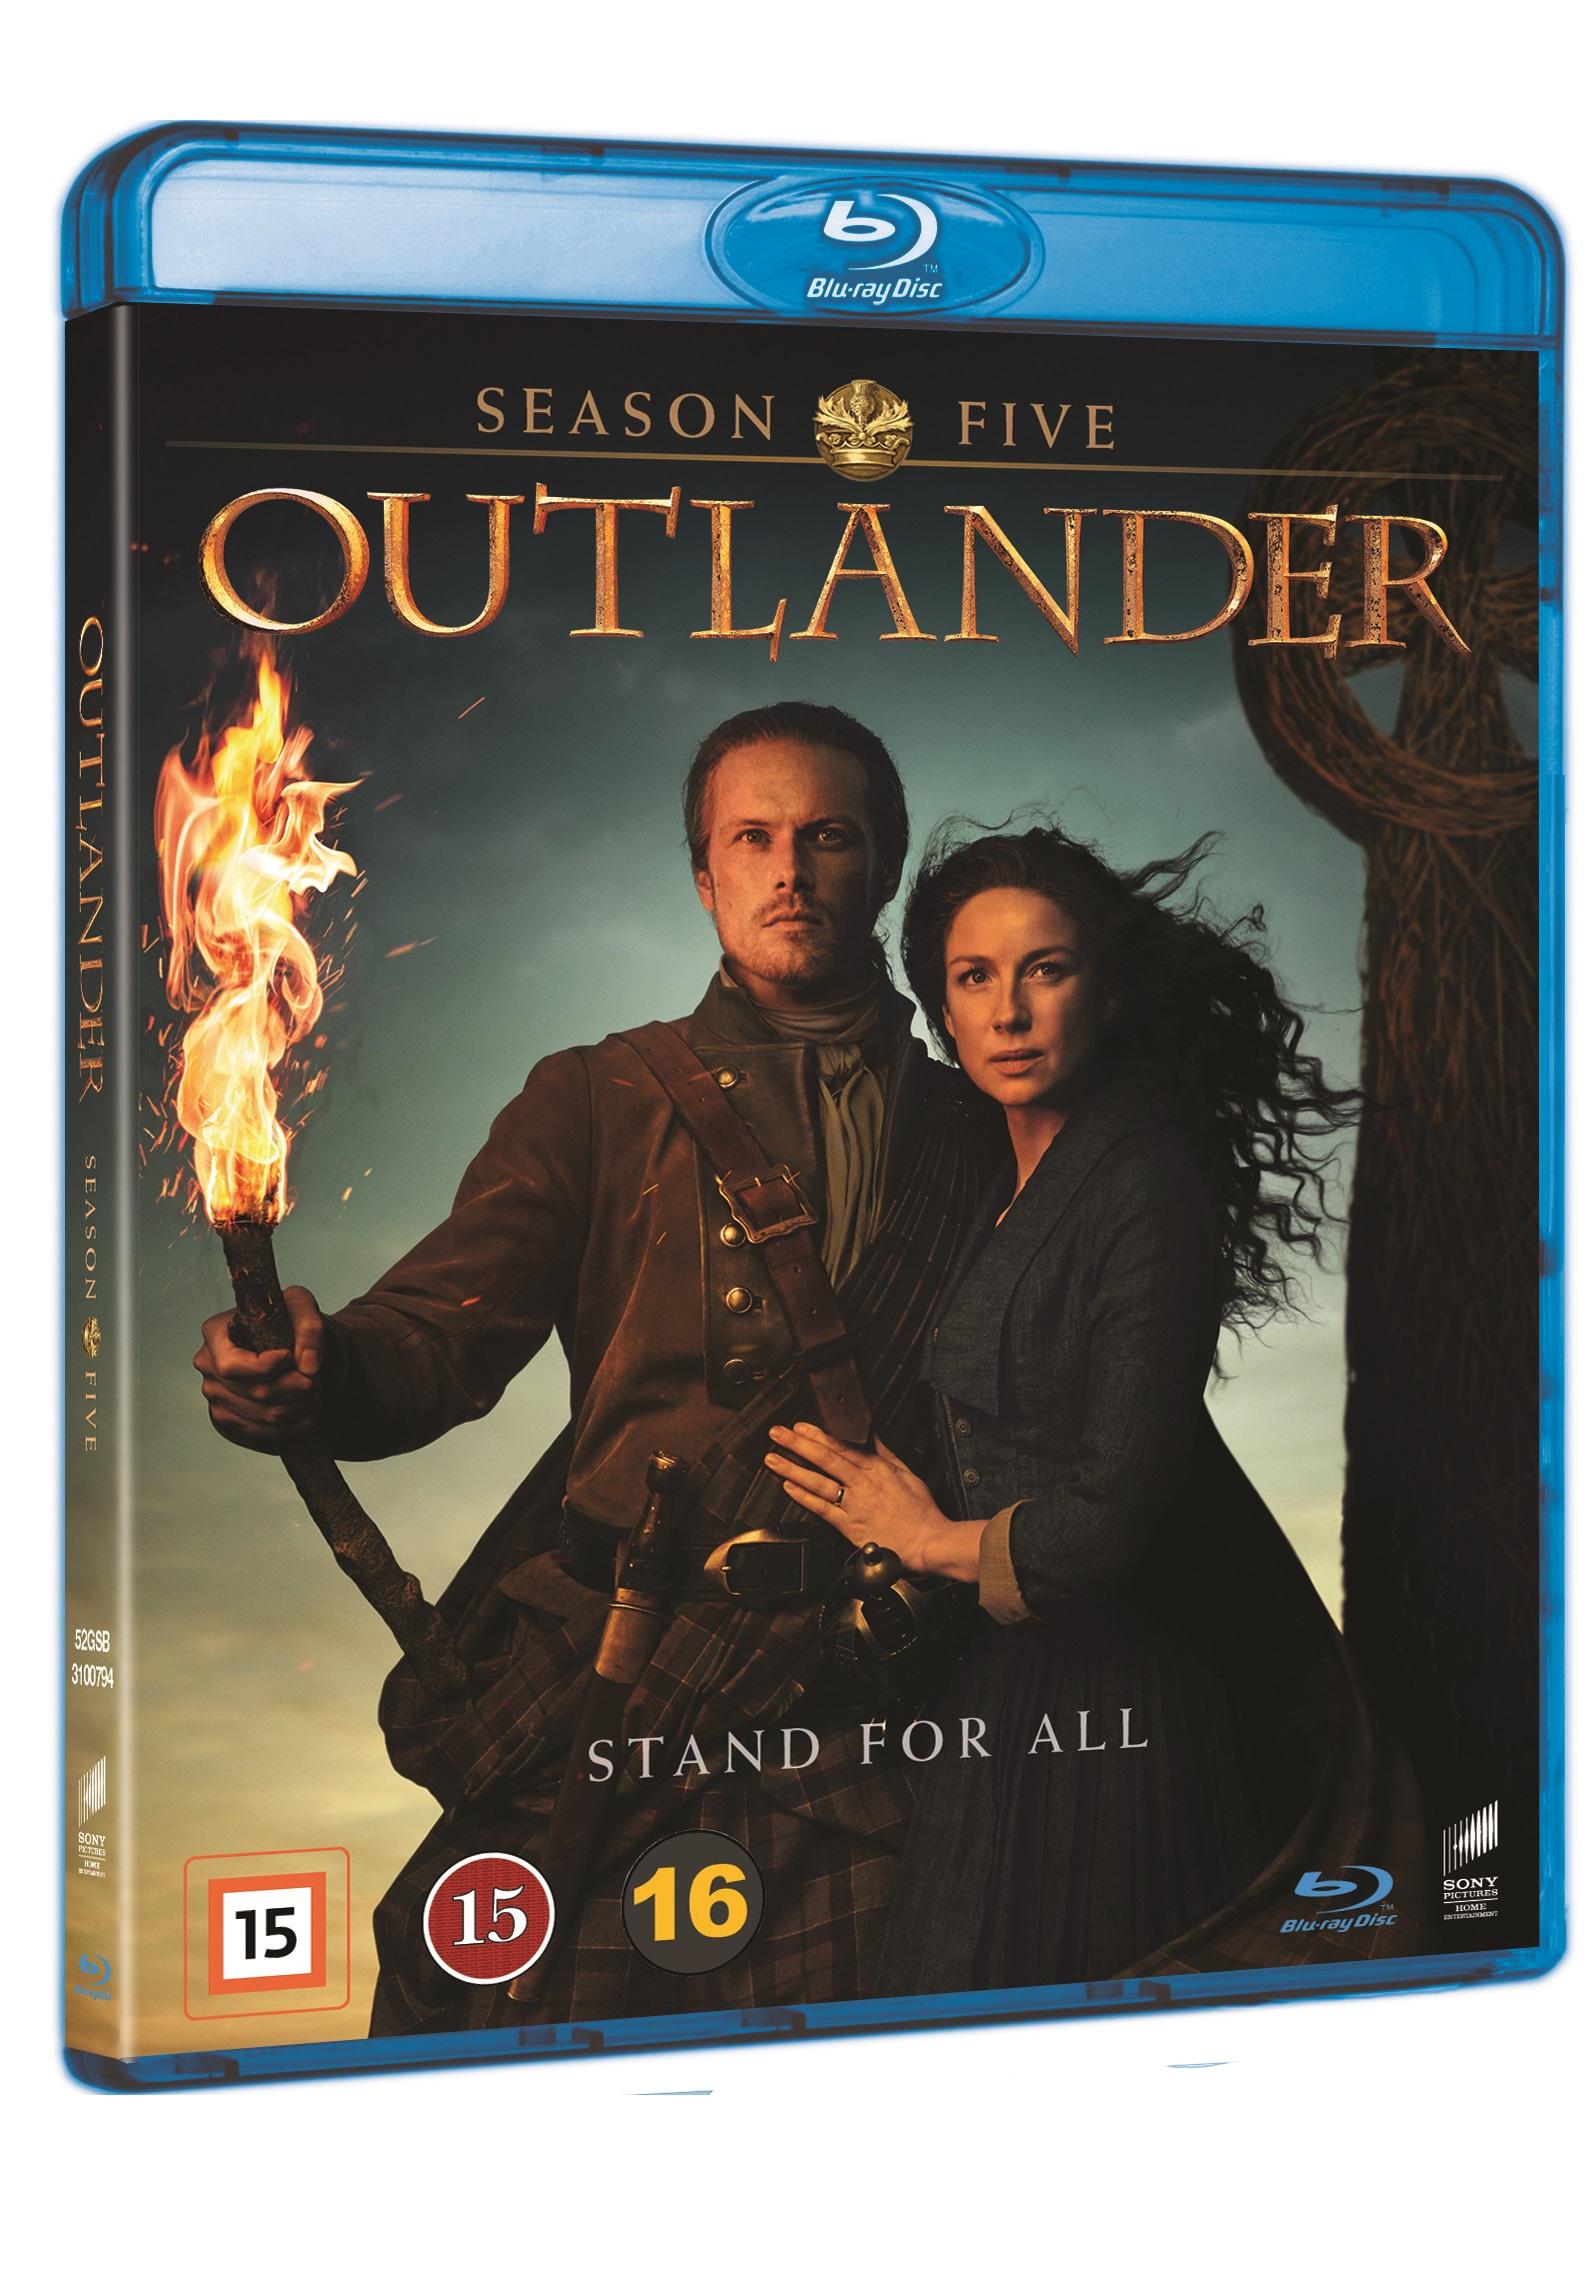 Outlander - Season 5 - Outlander - Film -  - 7330031007949 - 21/9-2020